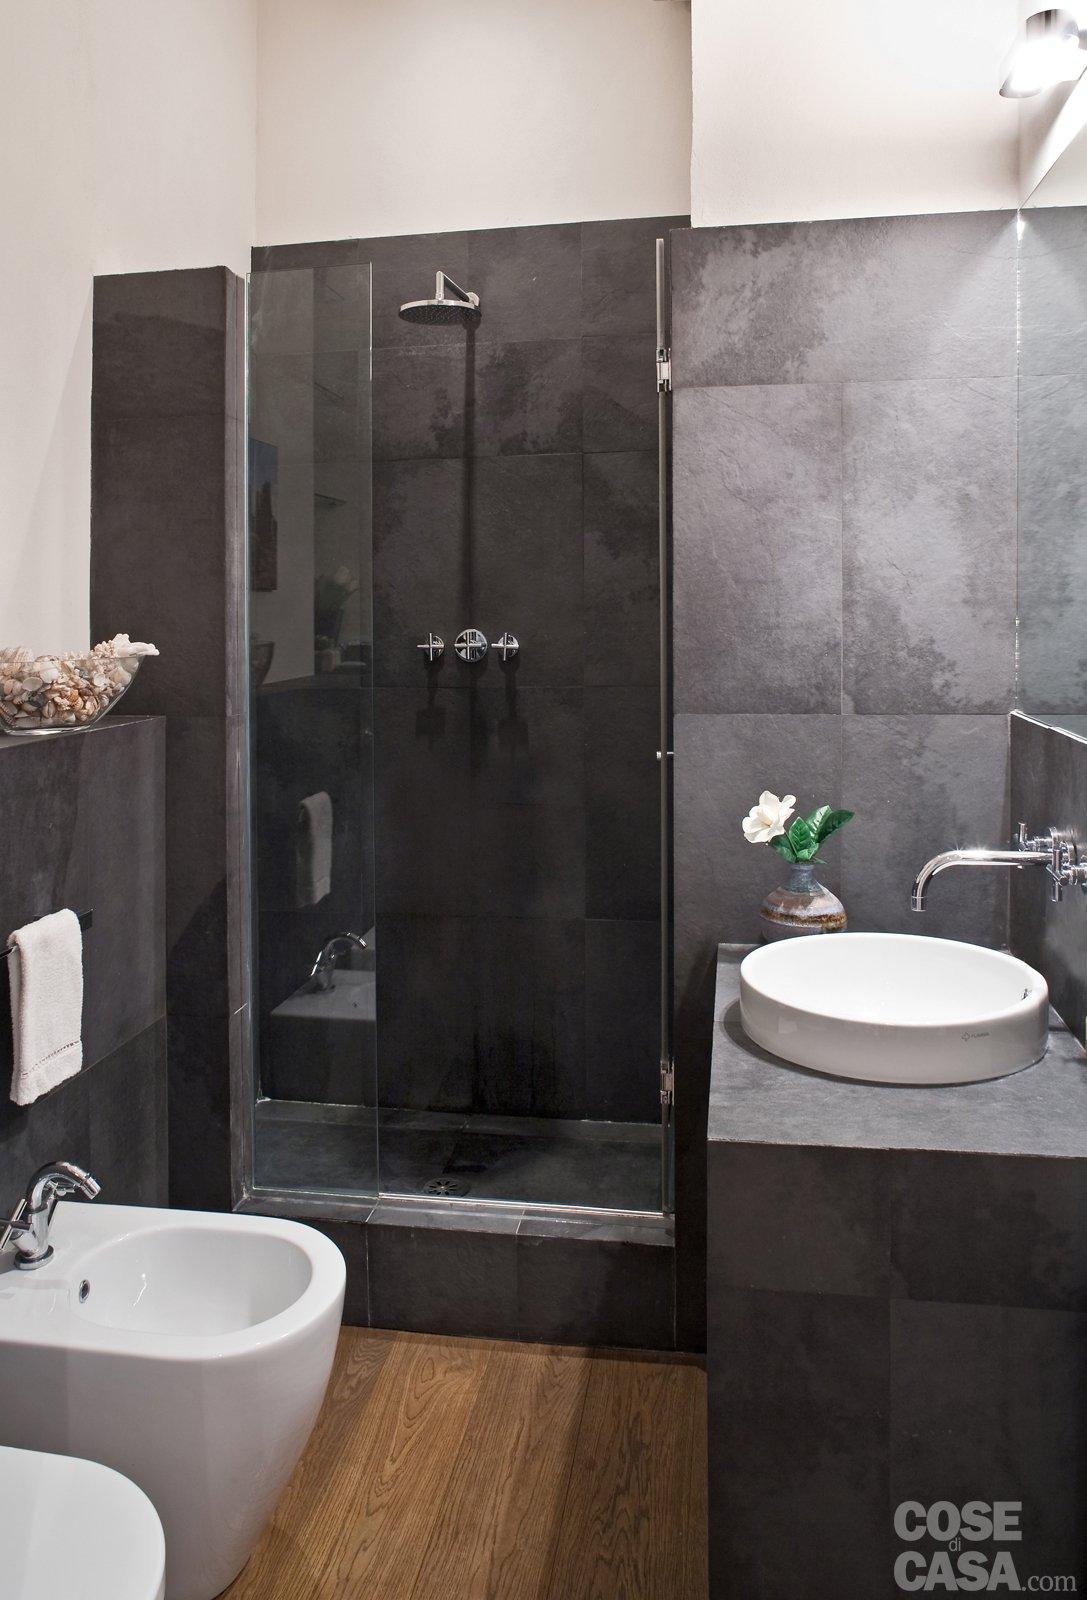 Una casa di 80 mq superfunzionali cose di casa - Finestra interna per bagno cieco ...